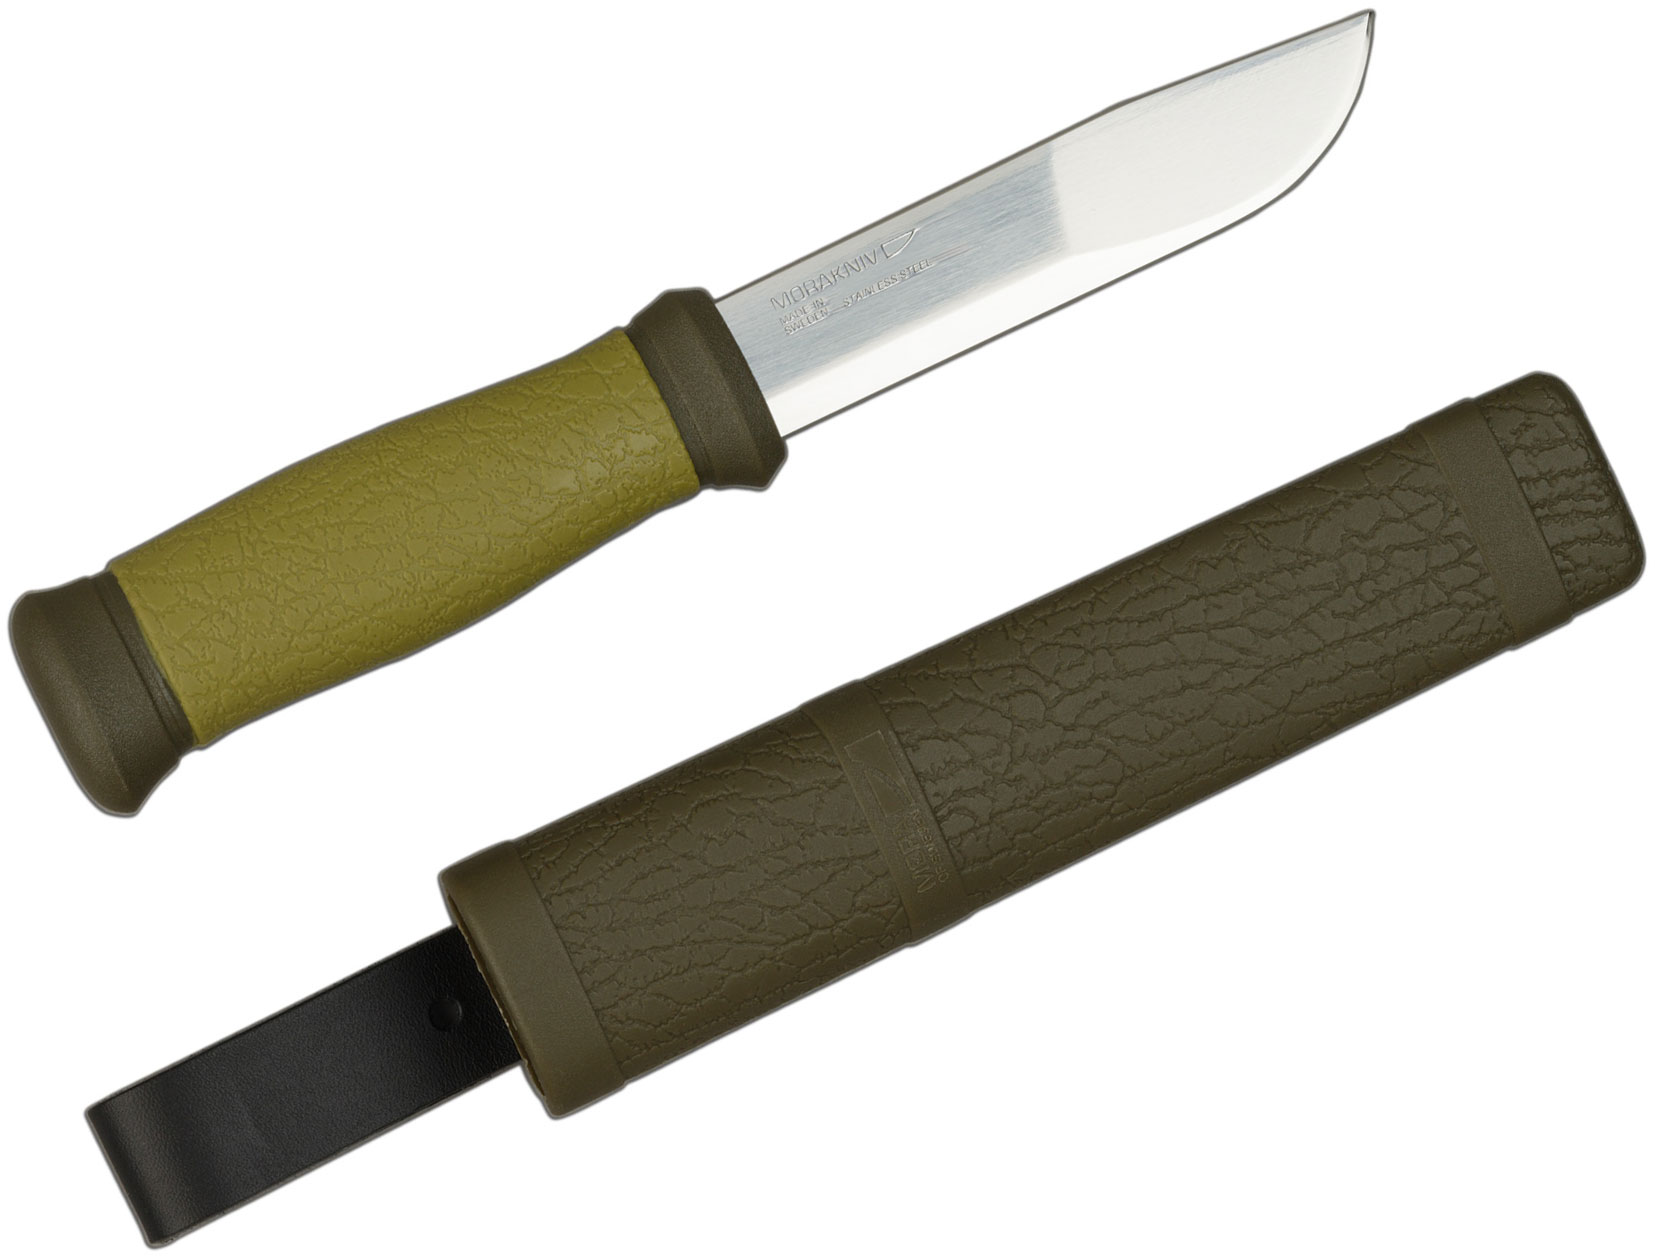 Morakniv Mora of Sweden Outdoor 2000 Utility Knife 4.3 inch Stainless Steel Blade, Olive Green Rubber Handle